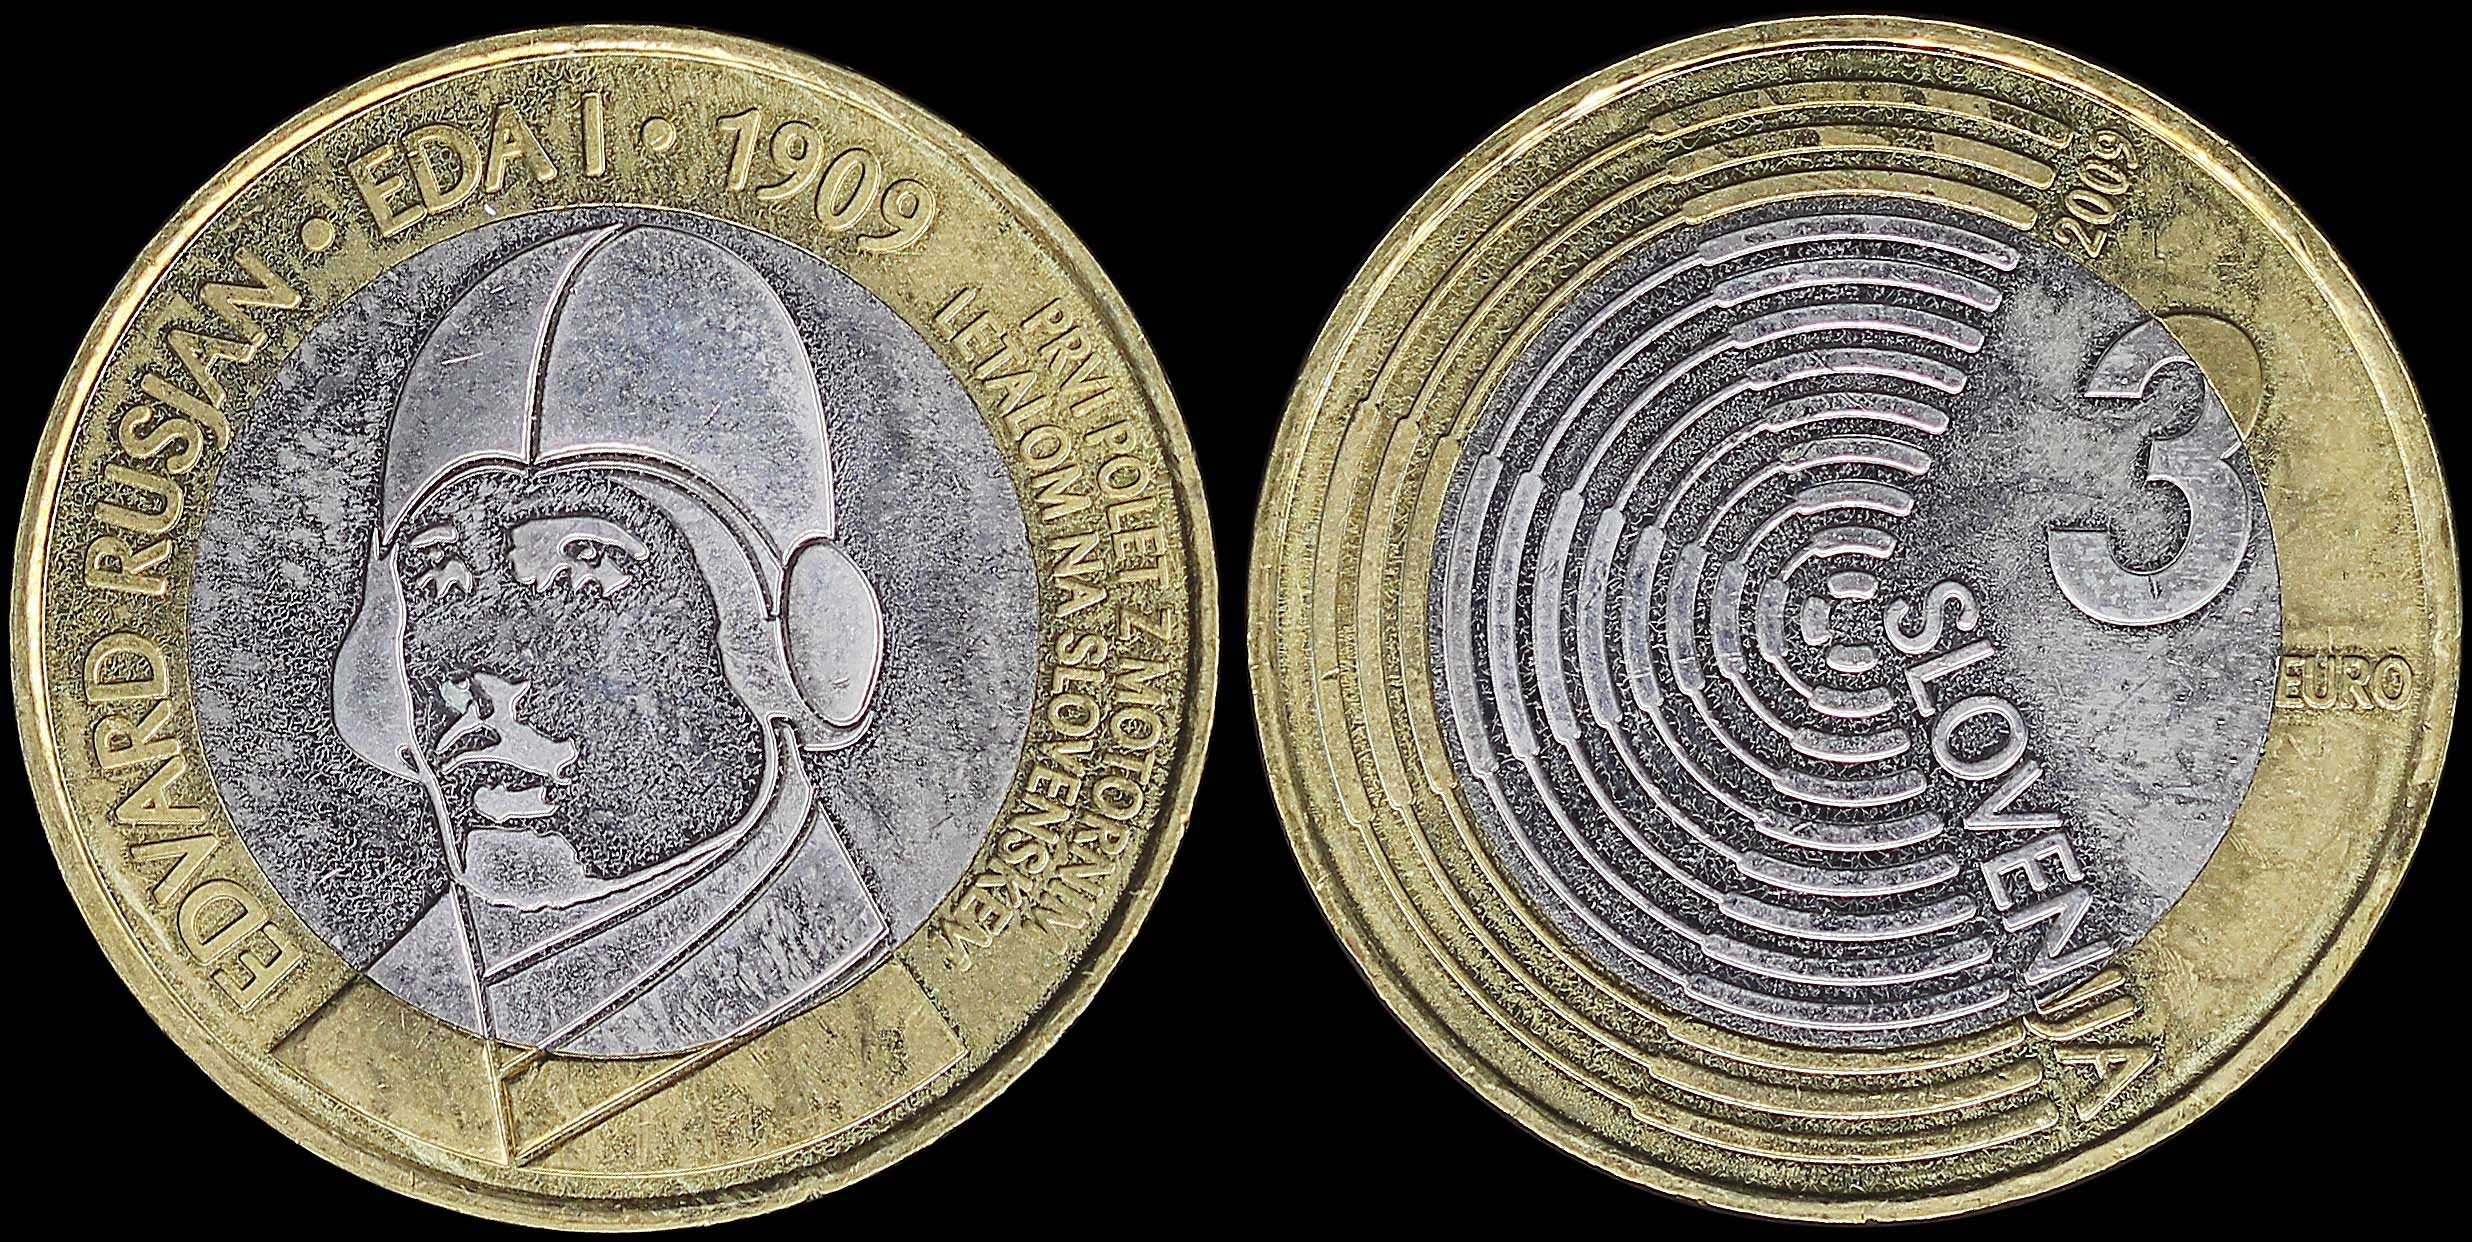 Lot 7039 - -  COINS & TOKENS COINS & TOKENS OF EUROPEAN COUNTRIES -  A. Karamitsos Postal & Live Internet Auction 984 (Part B)